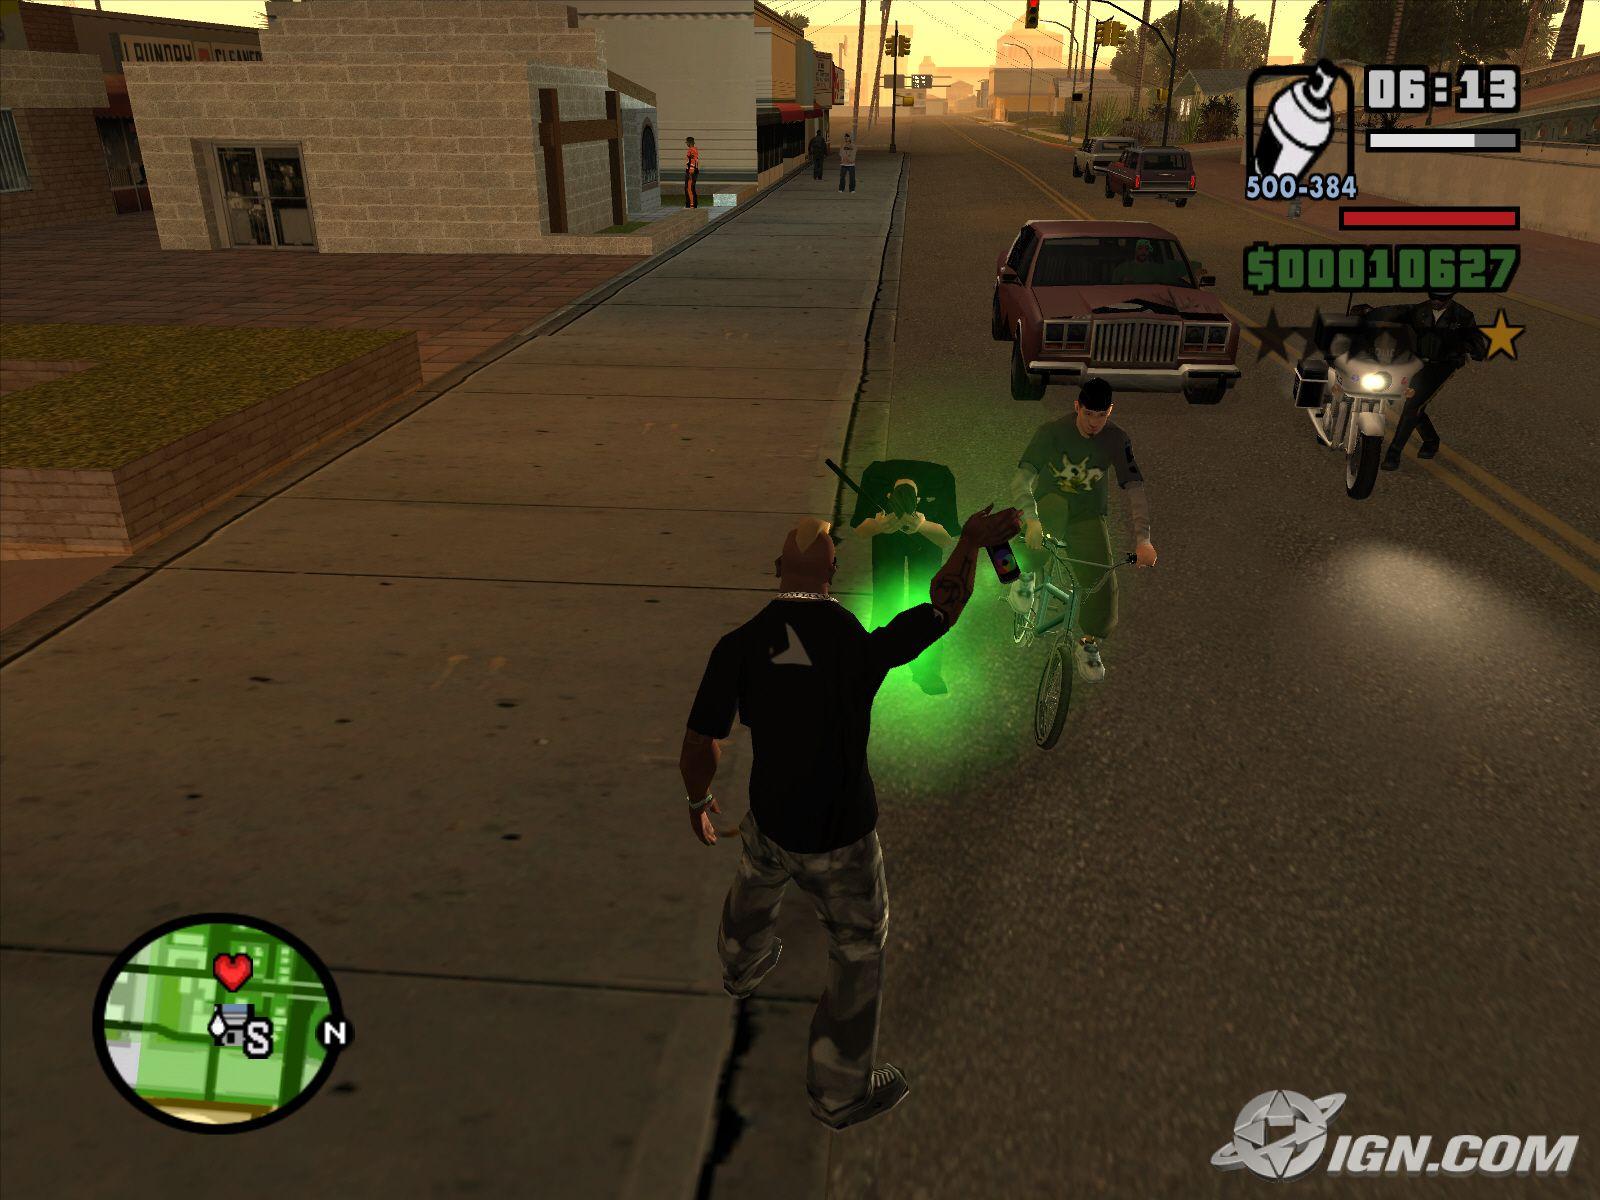 ⚡ San andreas apk revdl   Free Gta San Andreas APK Download For PC